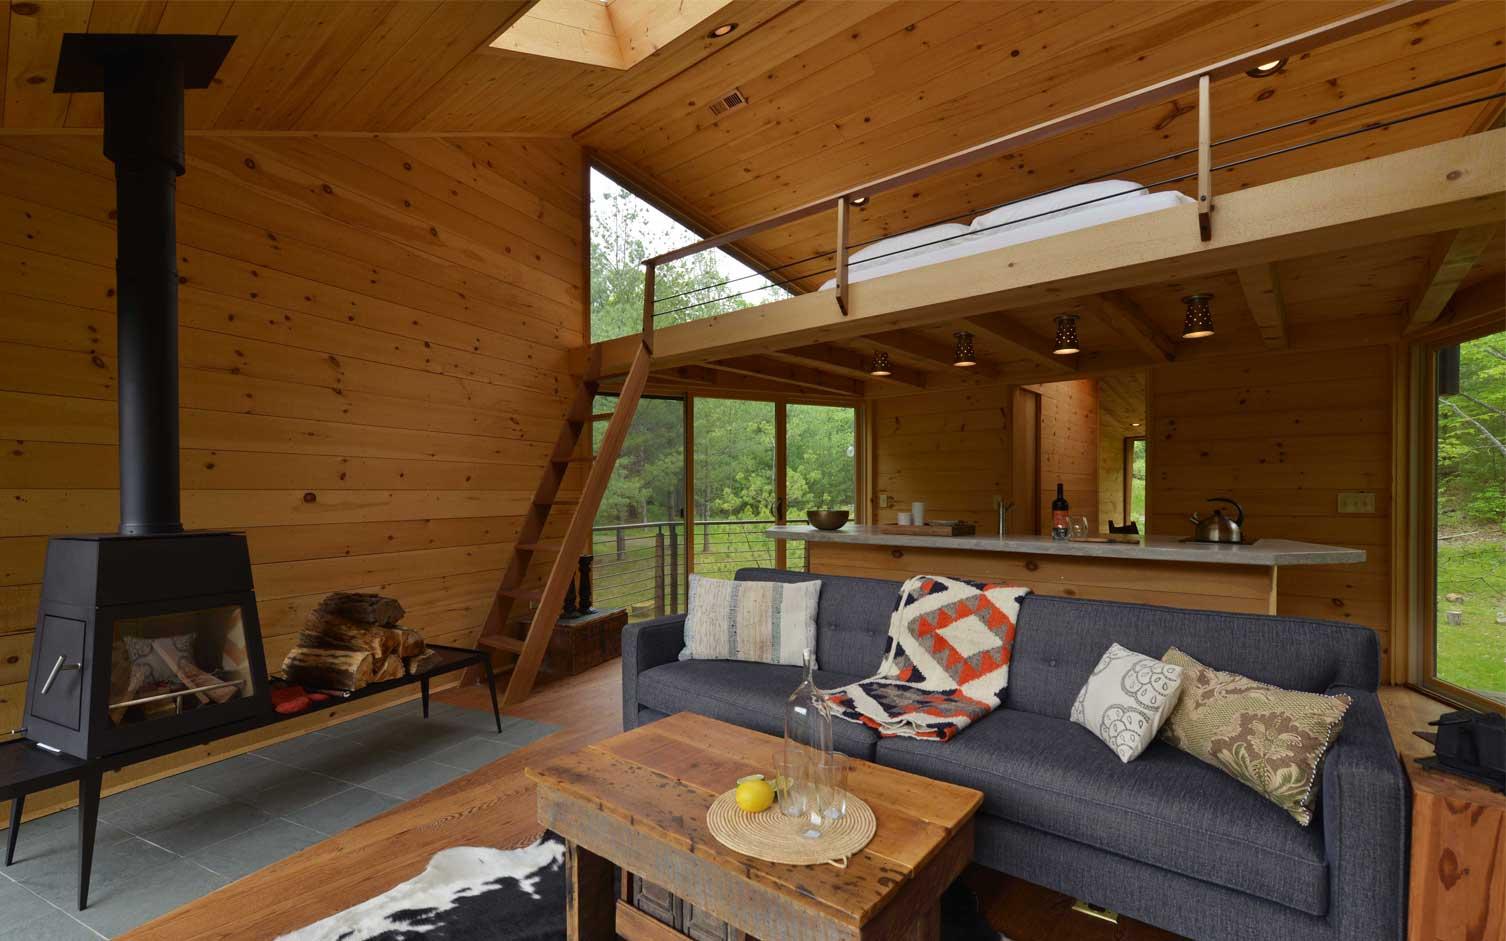 Woodstock treehouse, Antony Gibbons, modern treehouse, Catskills architecture